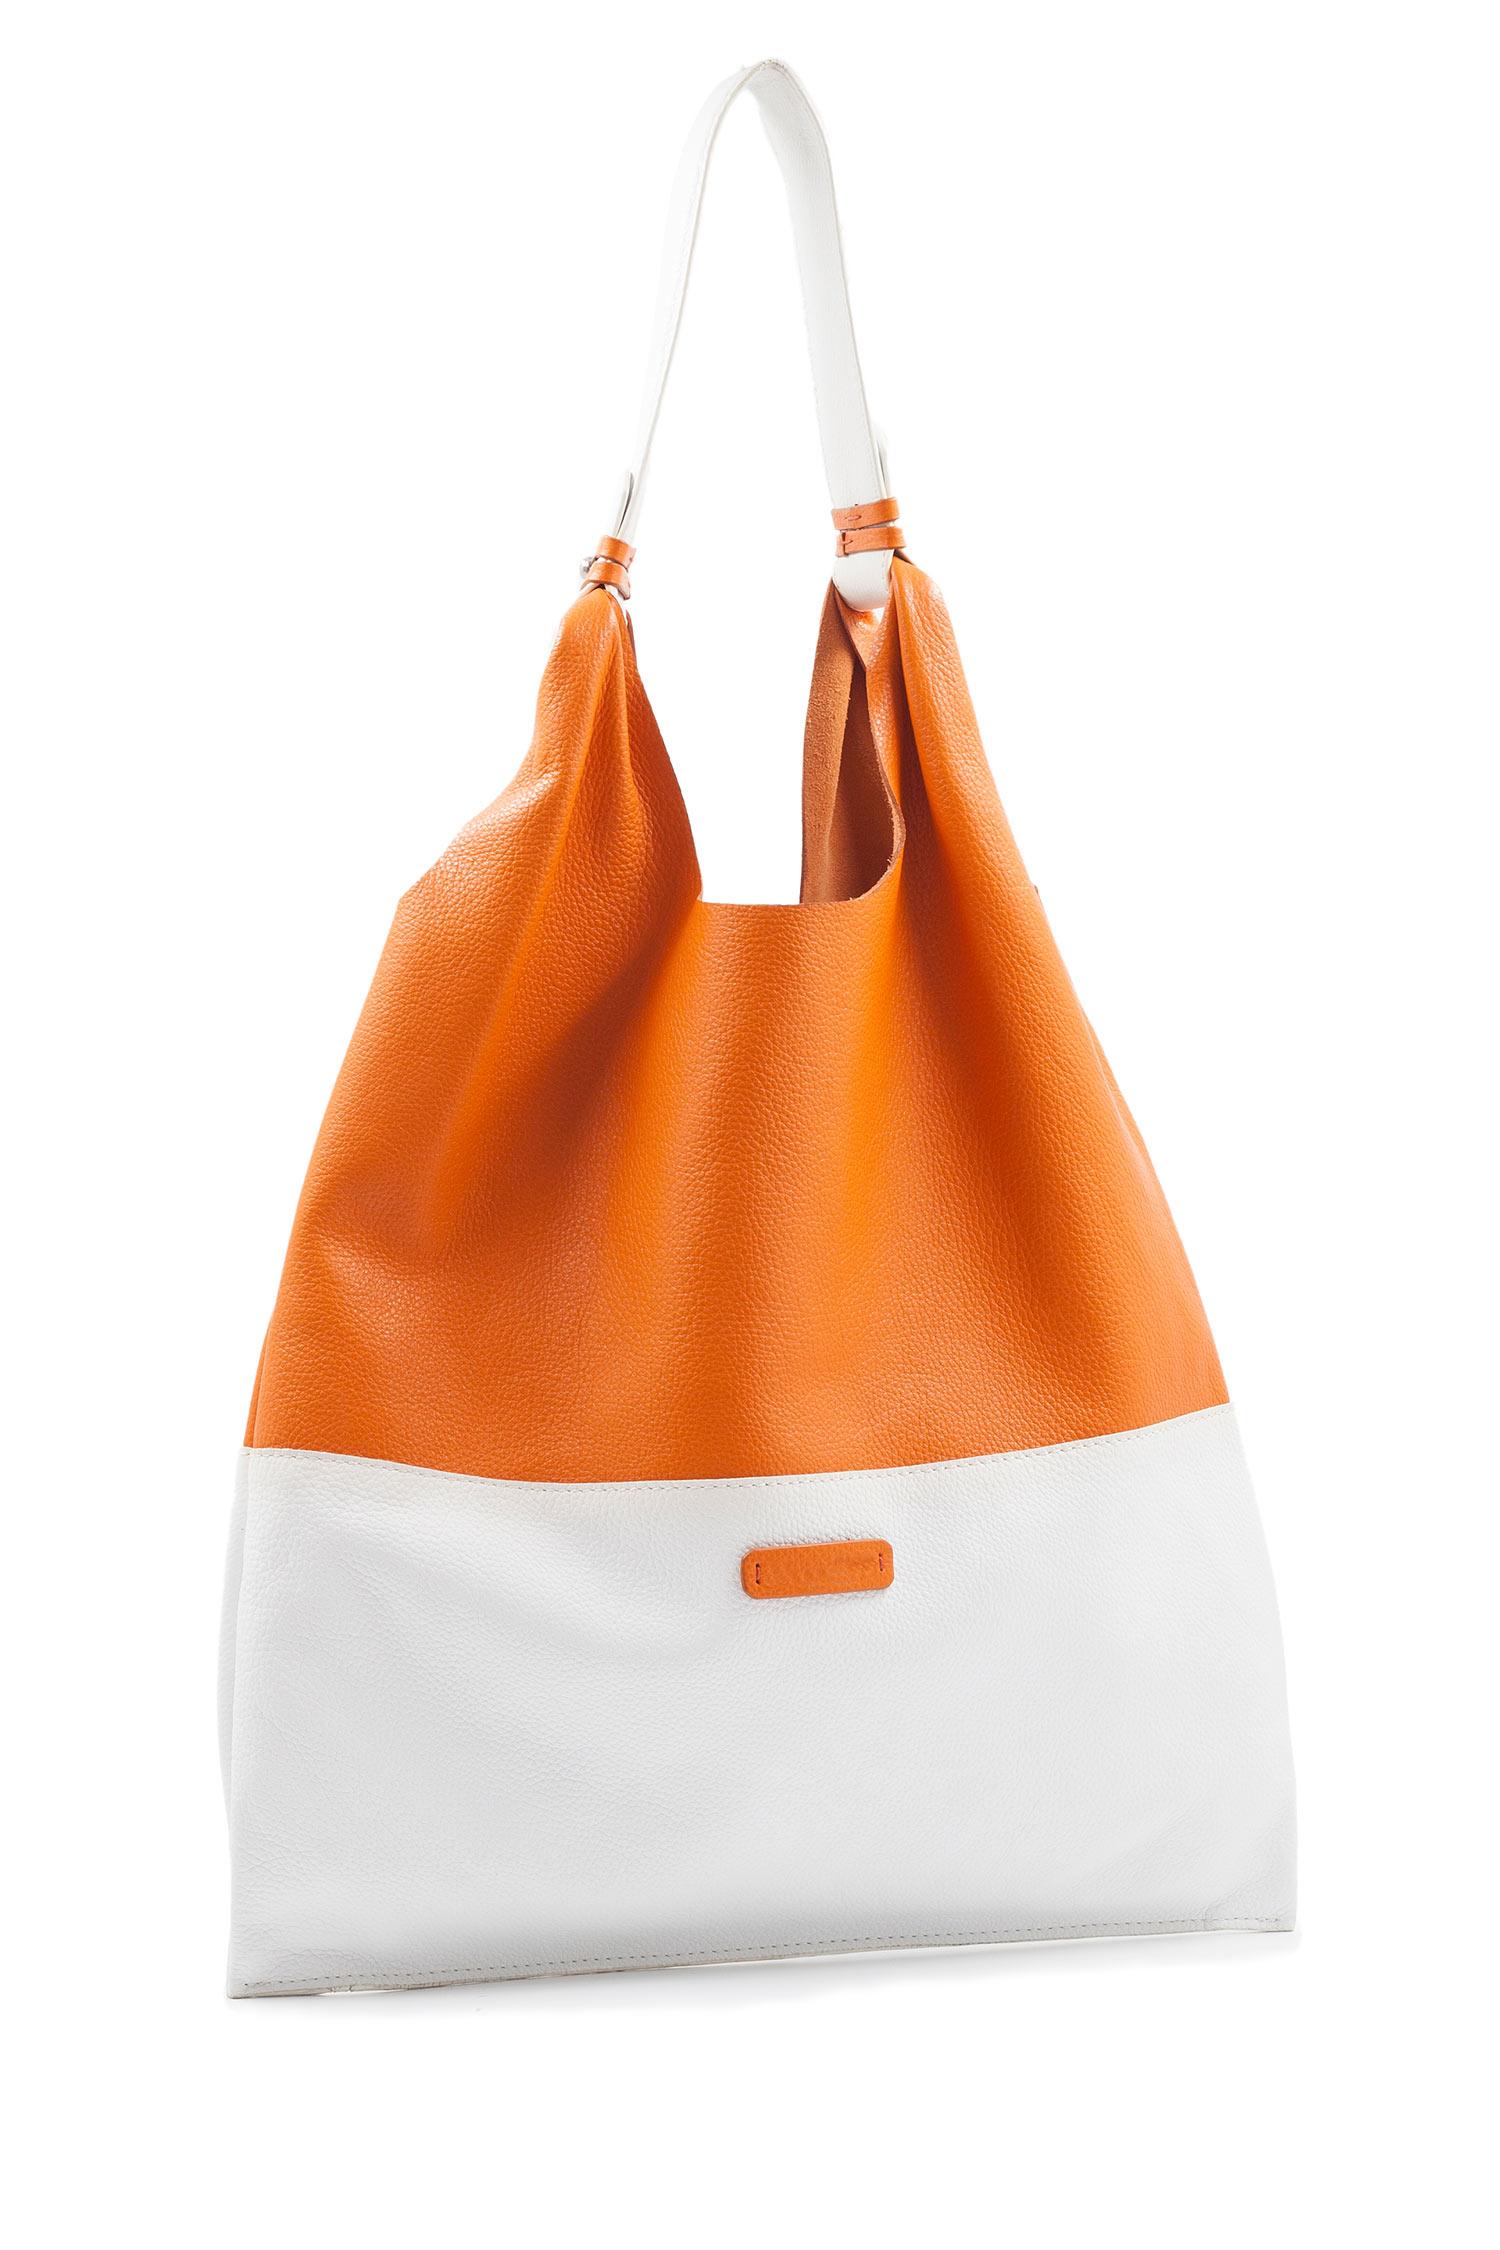 Modern 2017 Luxury Genuine Leather Woman Handbag